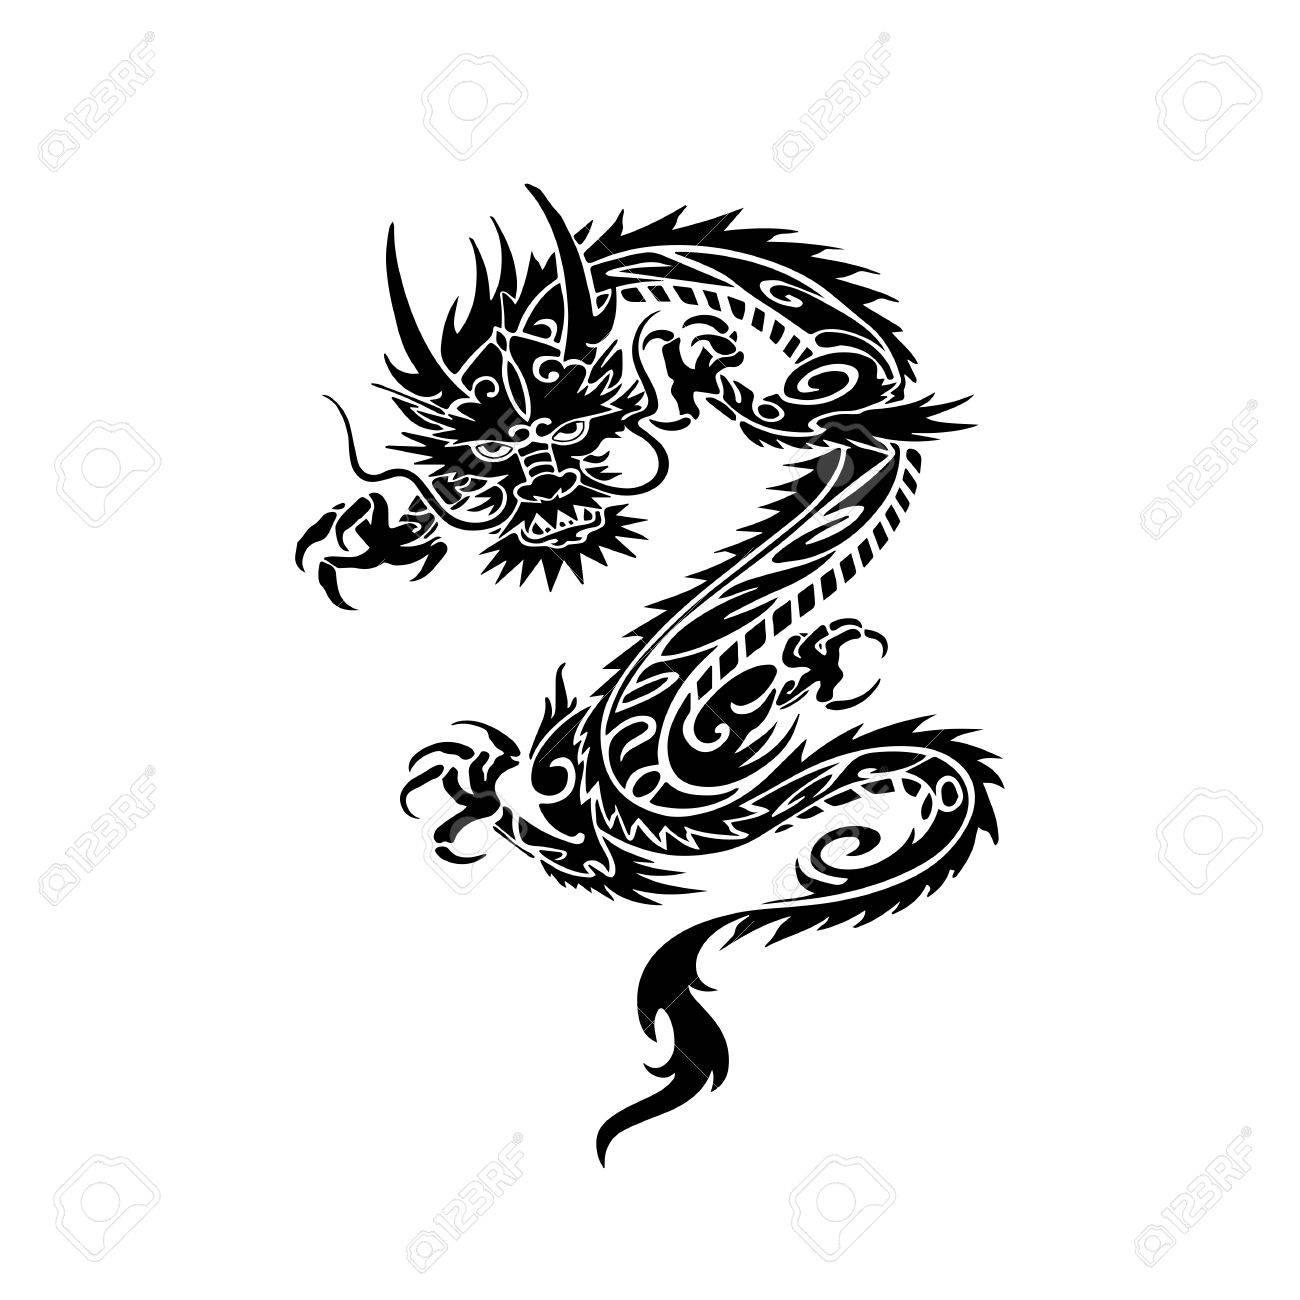 chinese dragon tattoo design